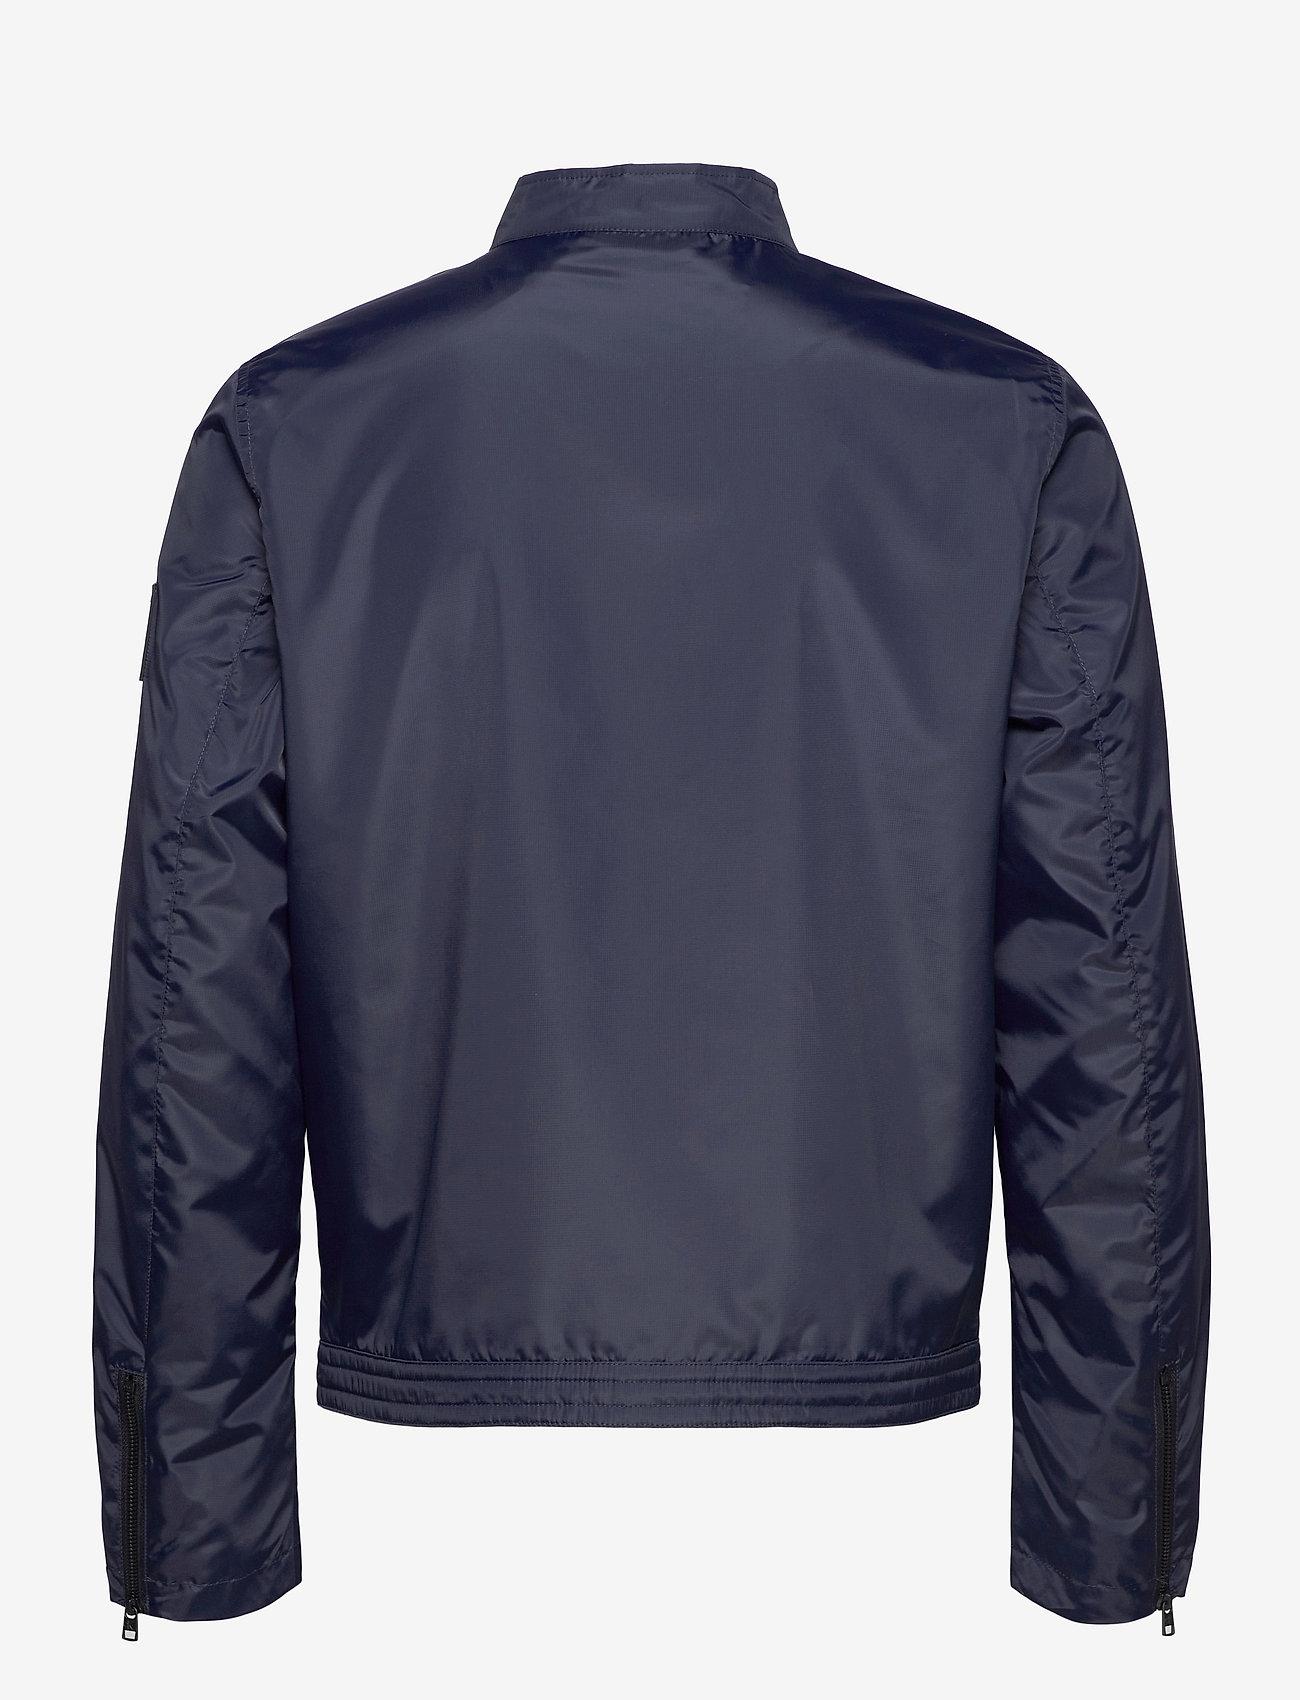 Calvin Klein Jeans - NYLON BIKER JACKET - vestes légères - night sky - 1